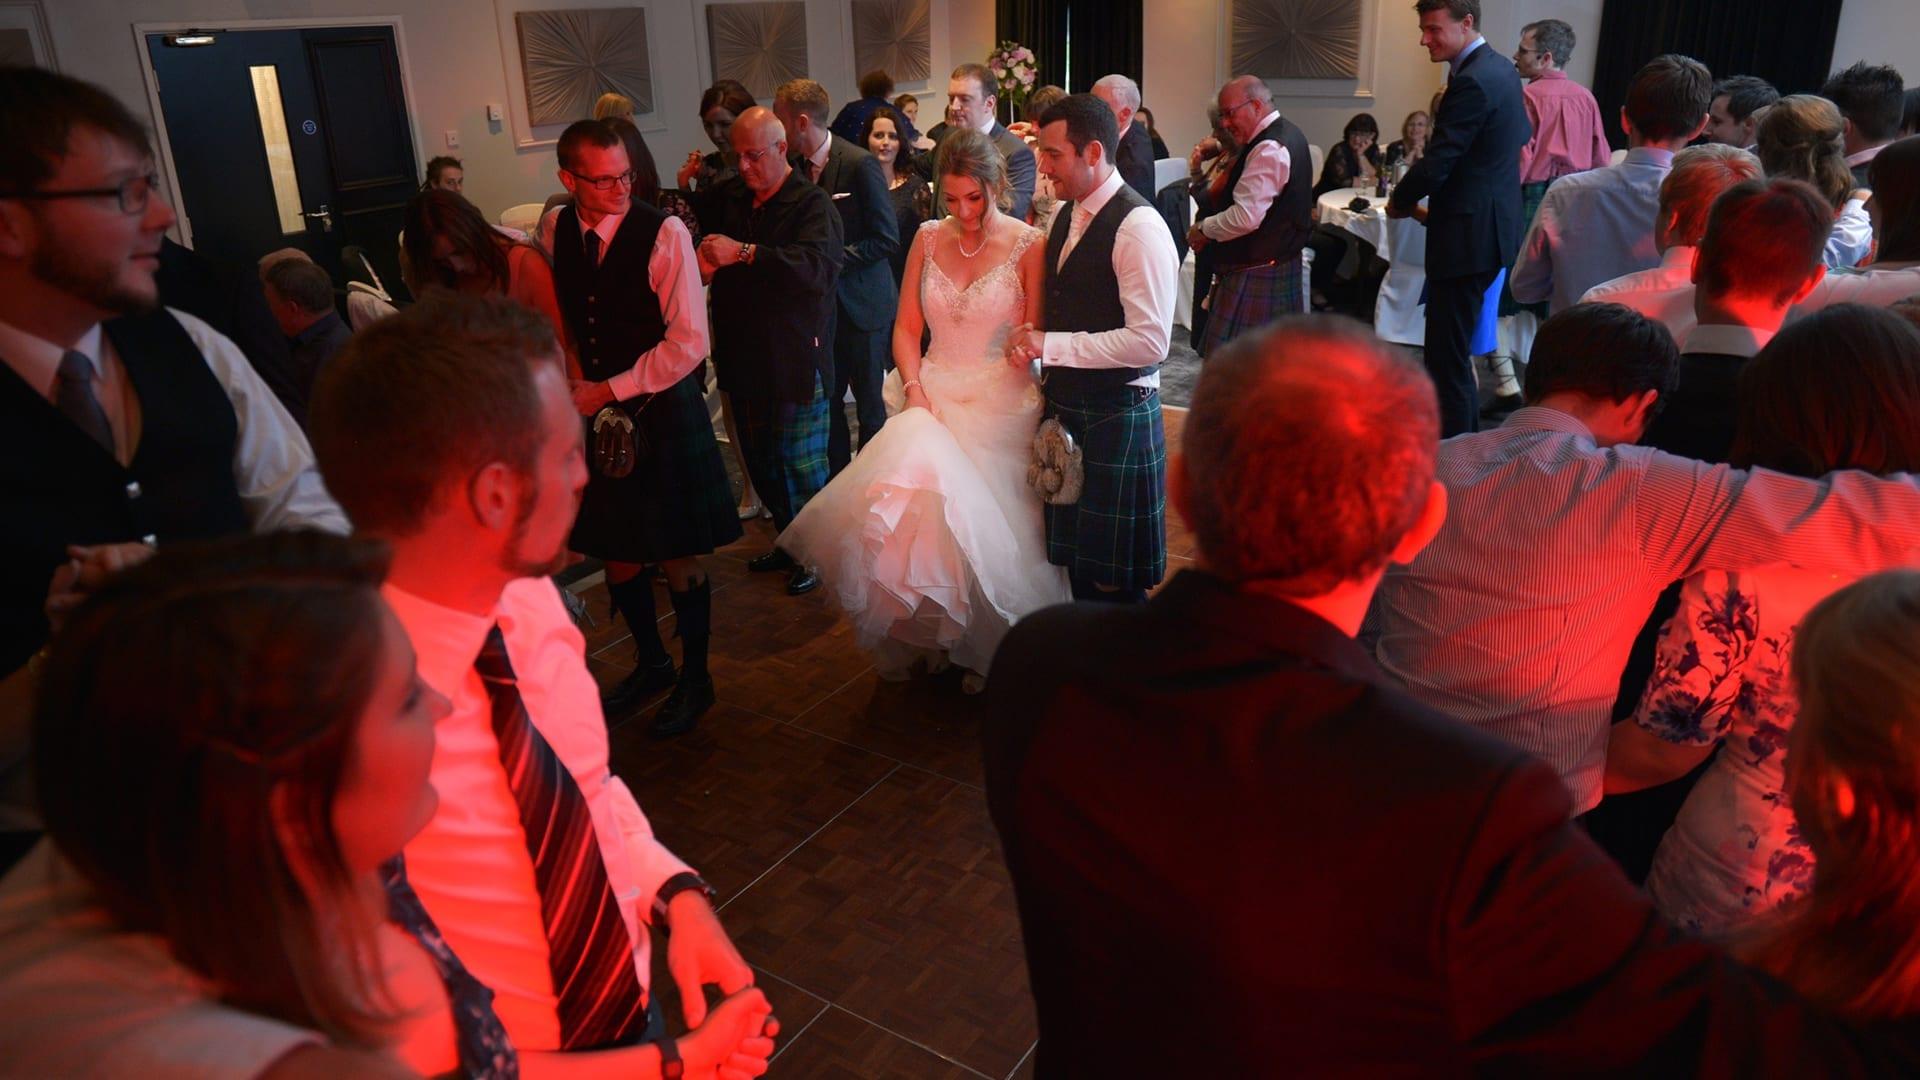 Ceilidh dancing at Barony Castle